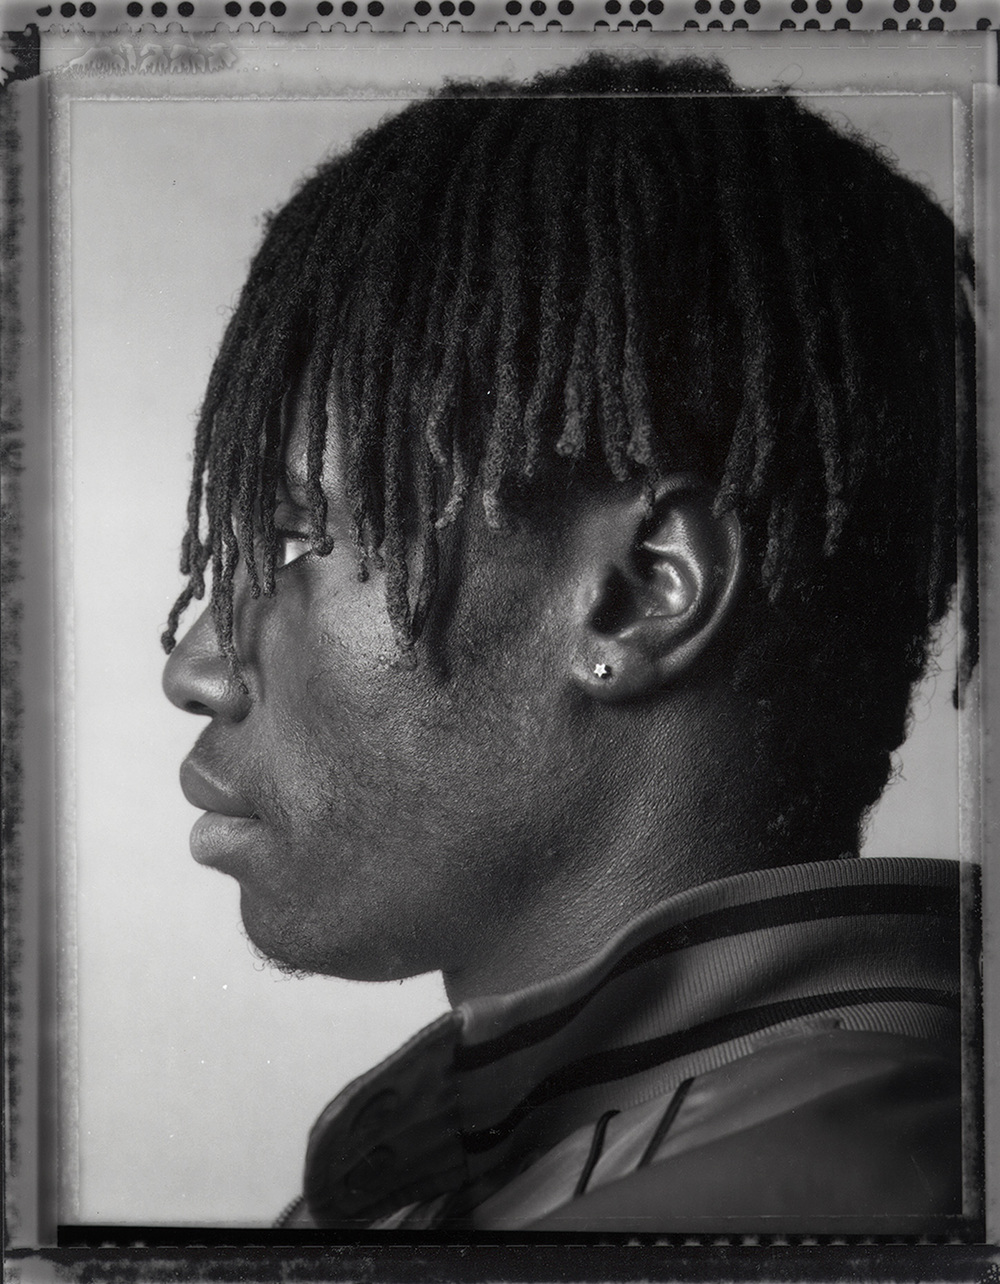 Portrait Photography Derek Israelsen profile